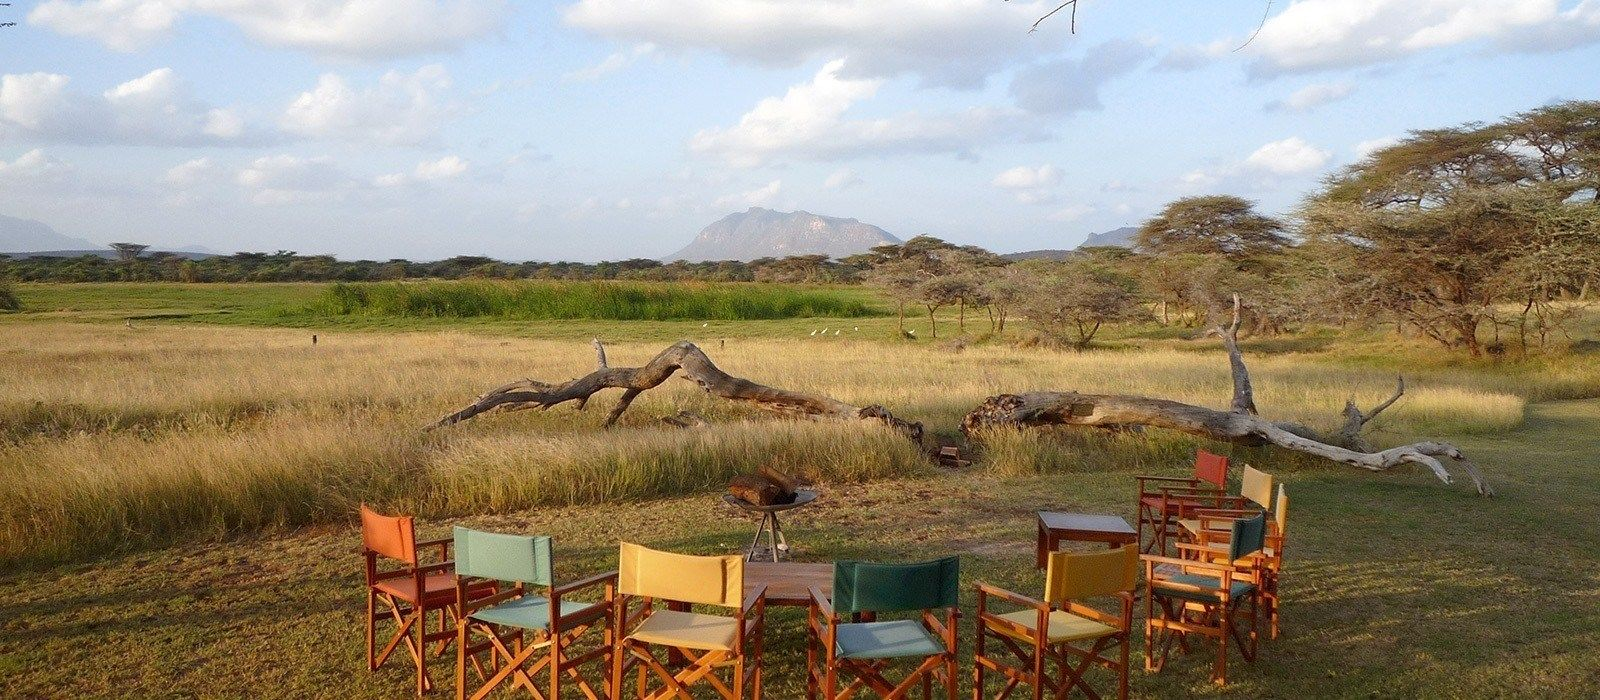 Kenia ganz Klassisch- Samburu, Masai Mara und Erholung am Strand Urlaub 3